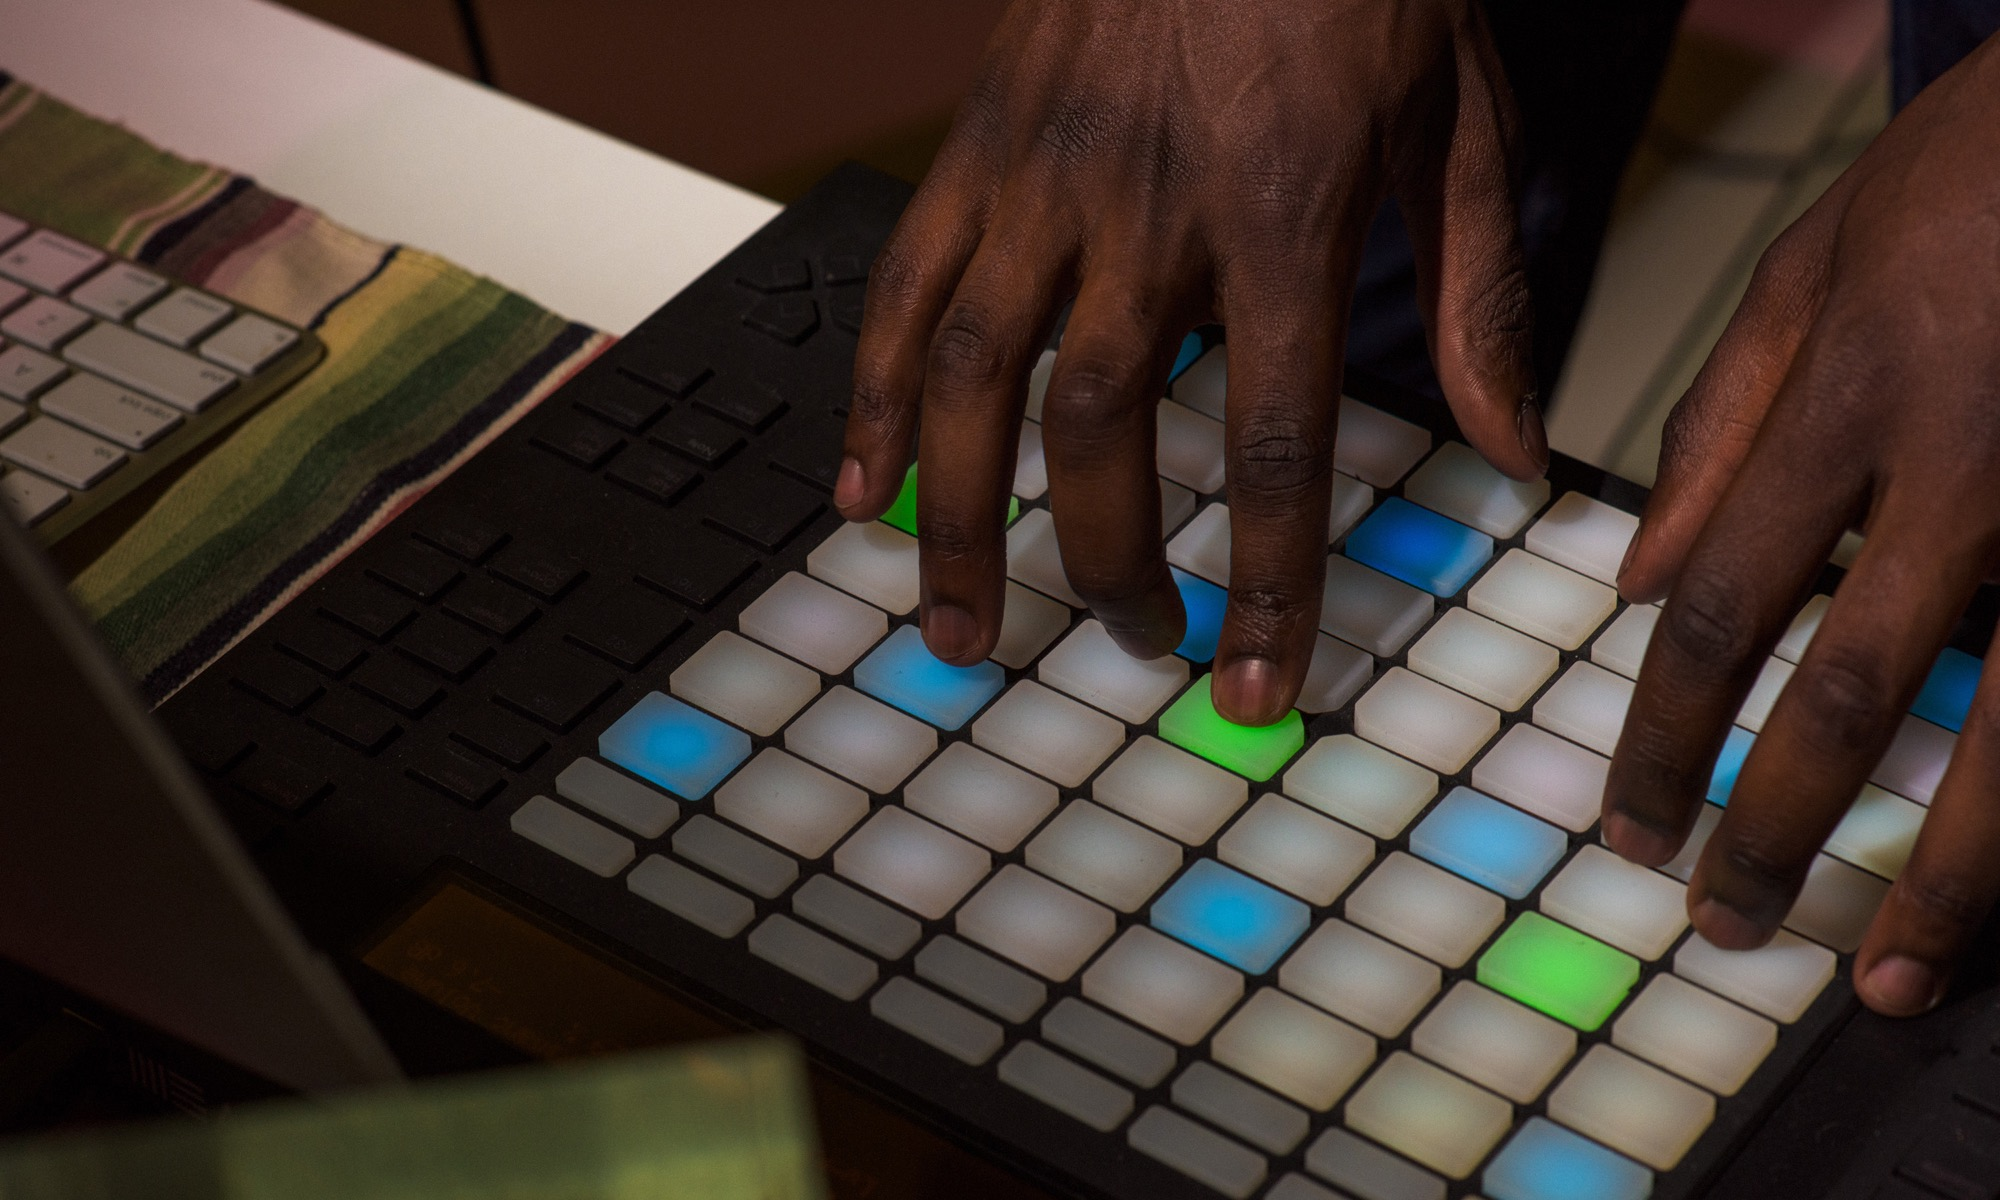 Music Creator using Gear